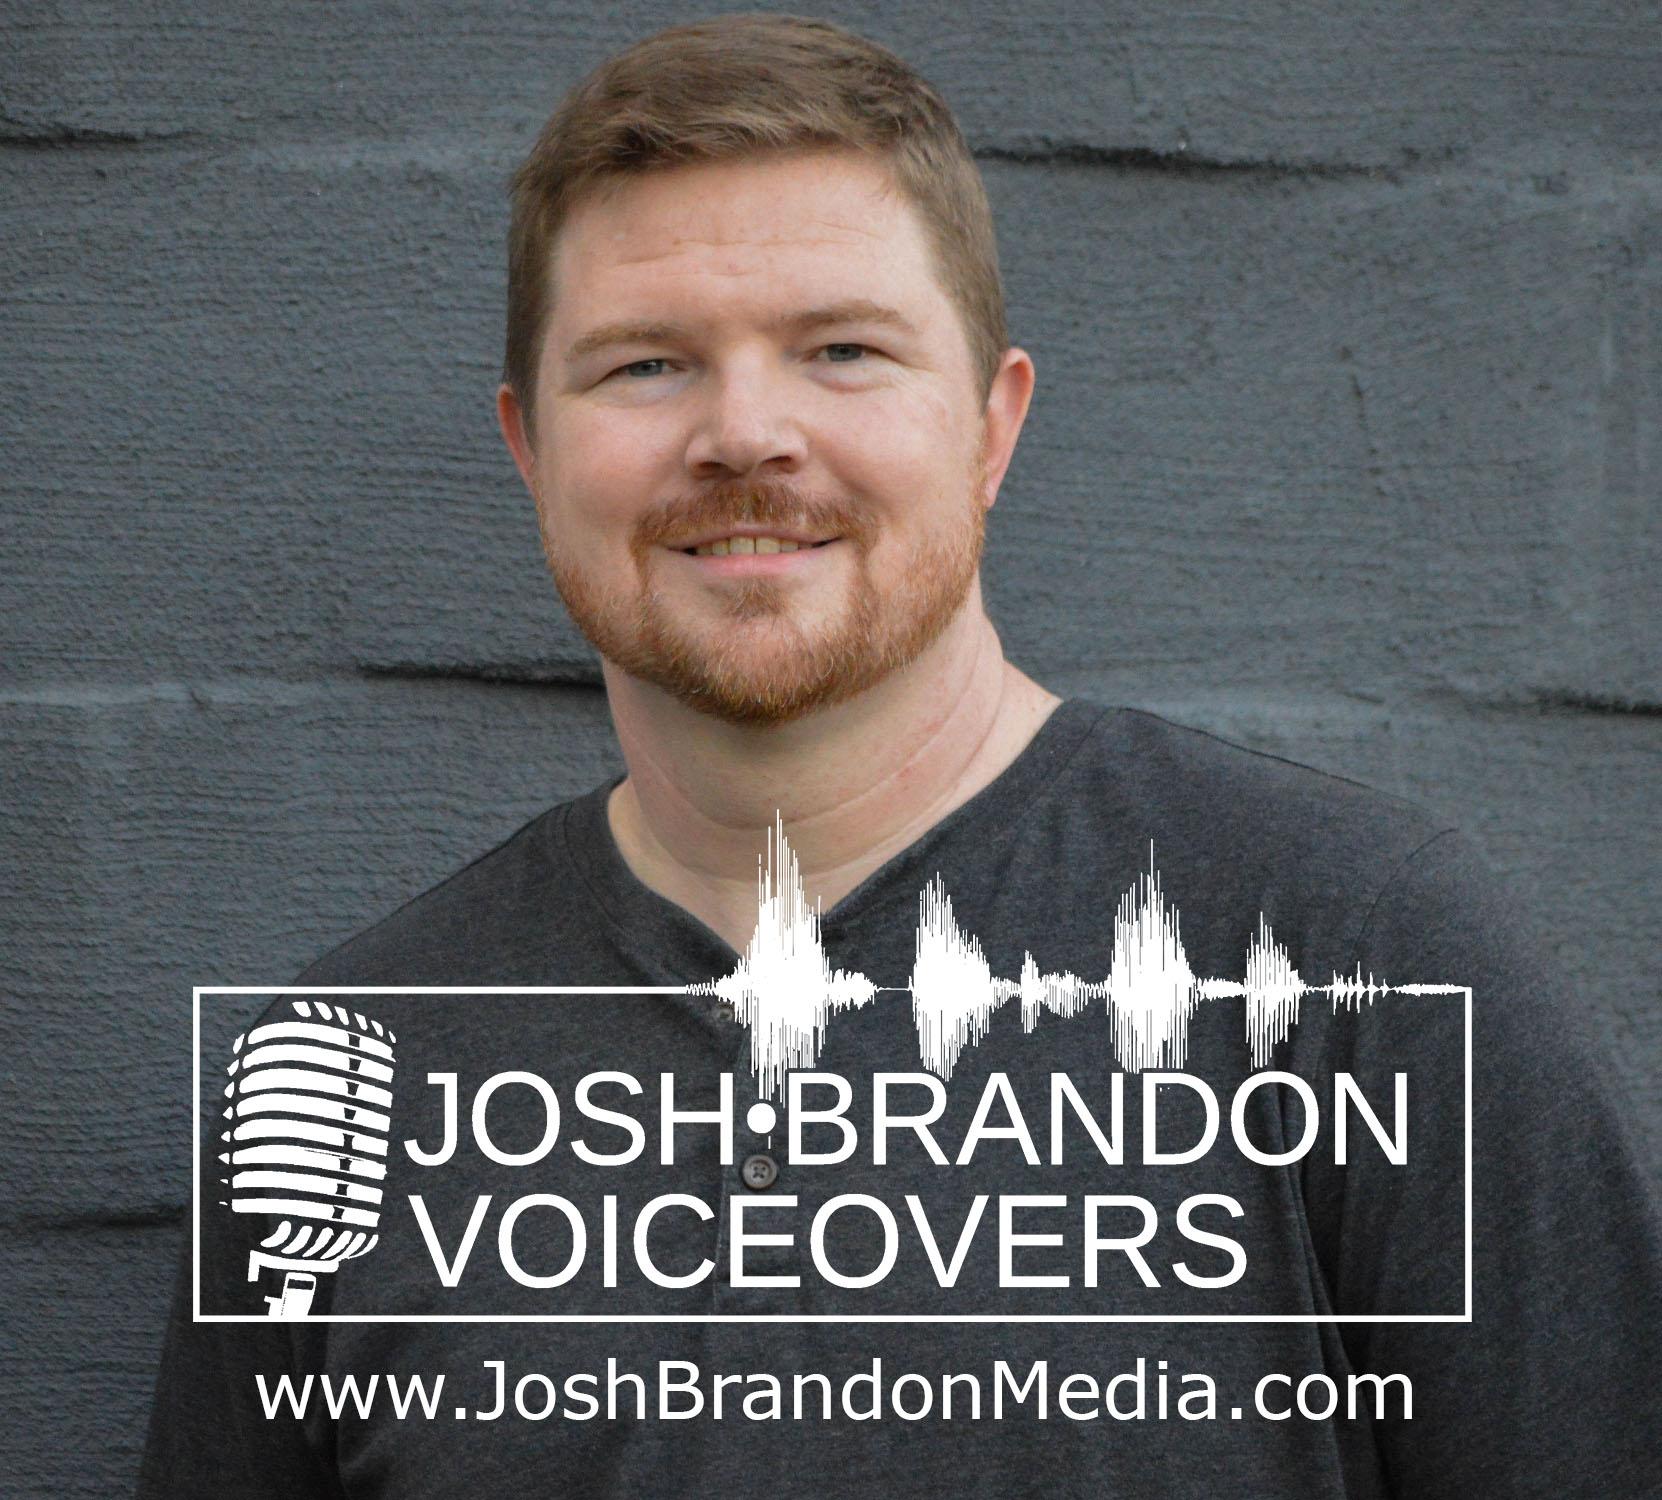 Josh Brandon Voiceovers, Voice Artist, Actor, Consultant